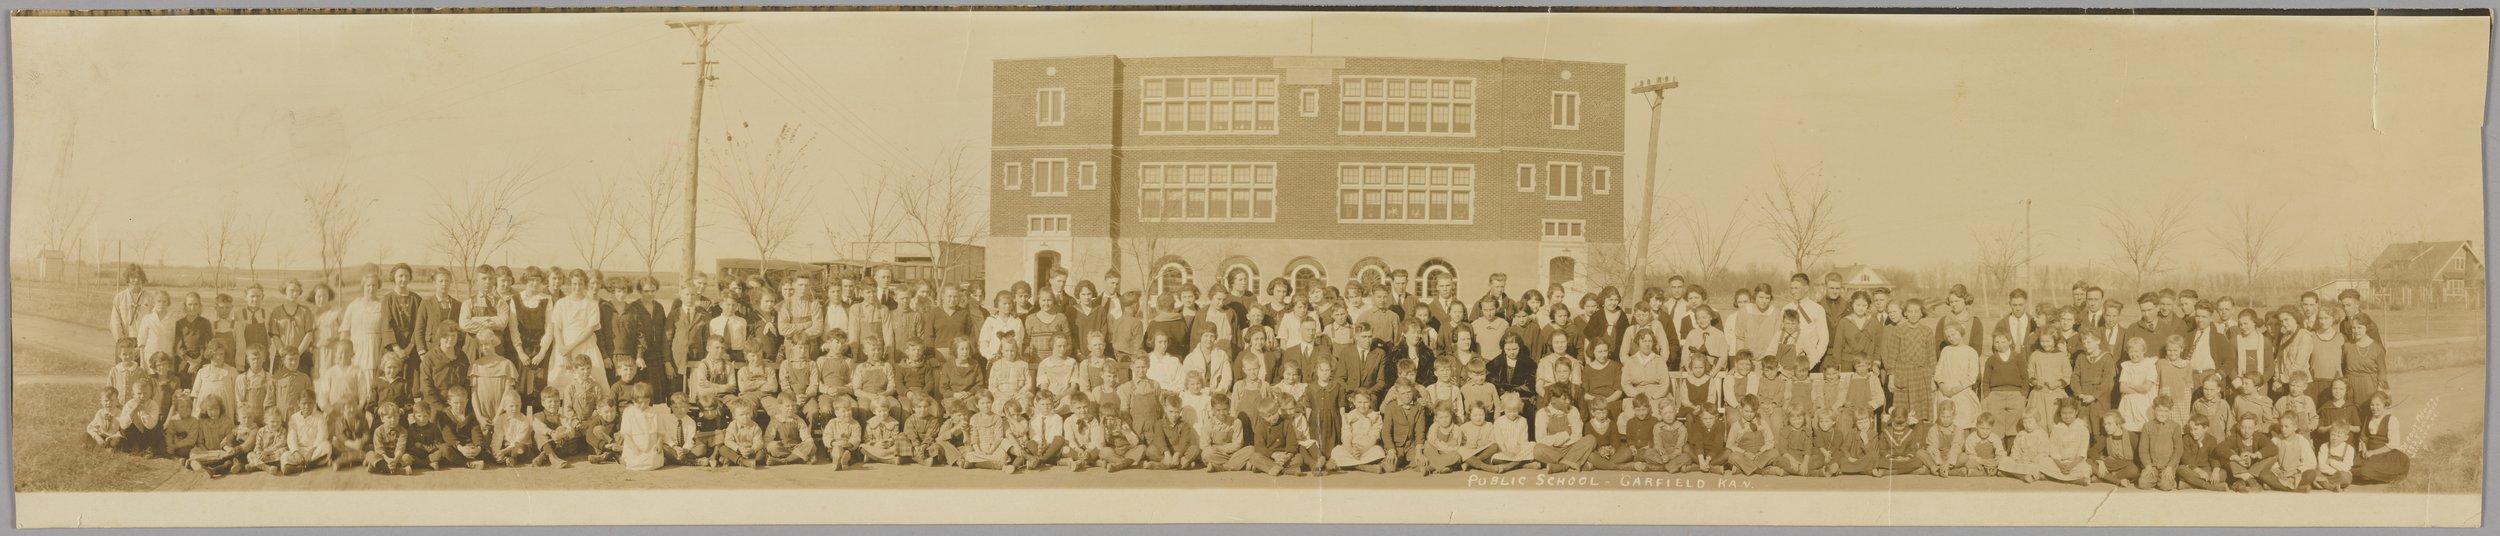 High school students in Garfield, Kansas - 1